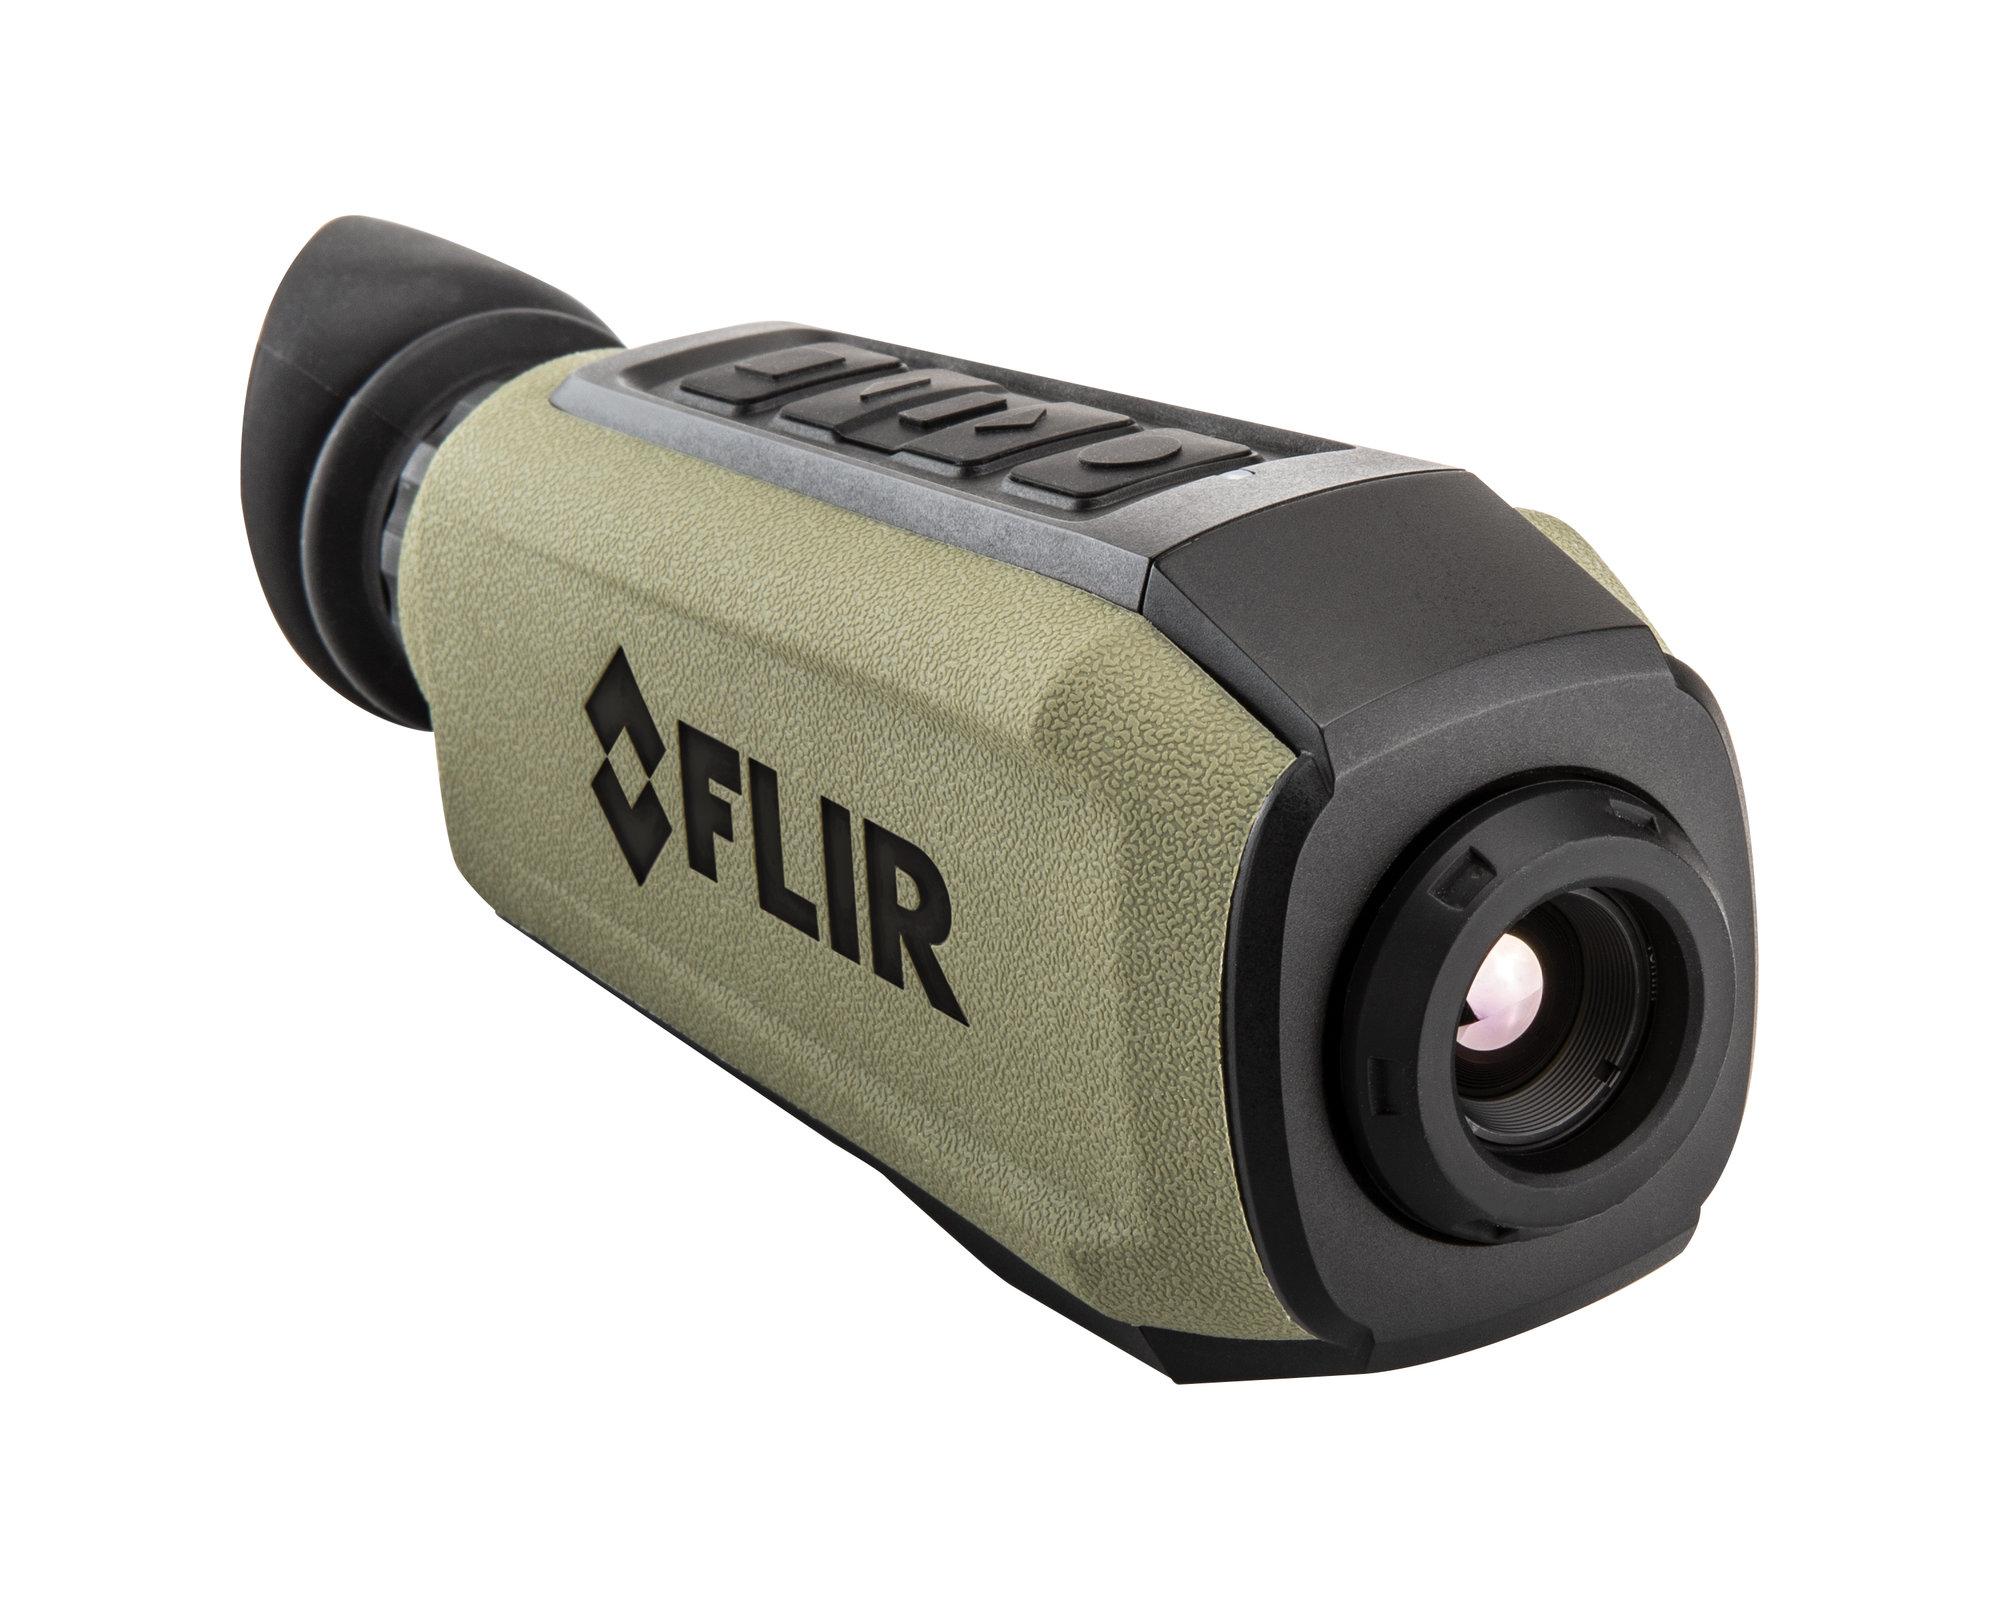 Termovízia FLIR SCION OTM 236 320x256 - 18 mm